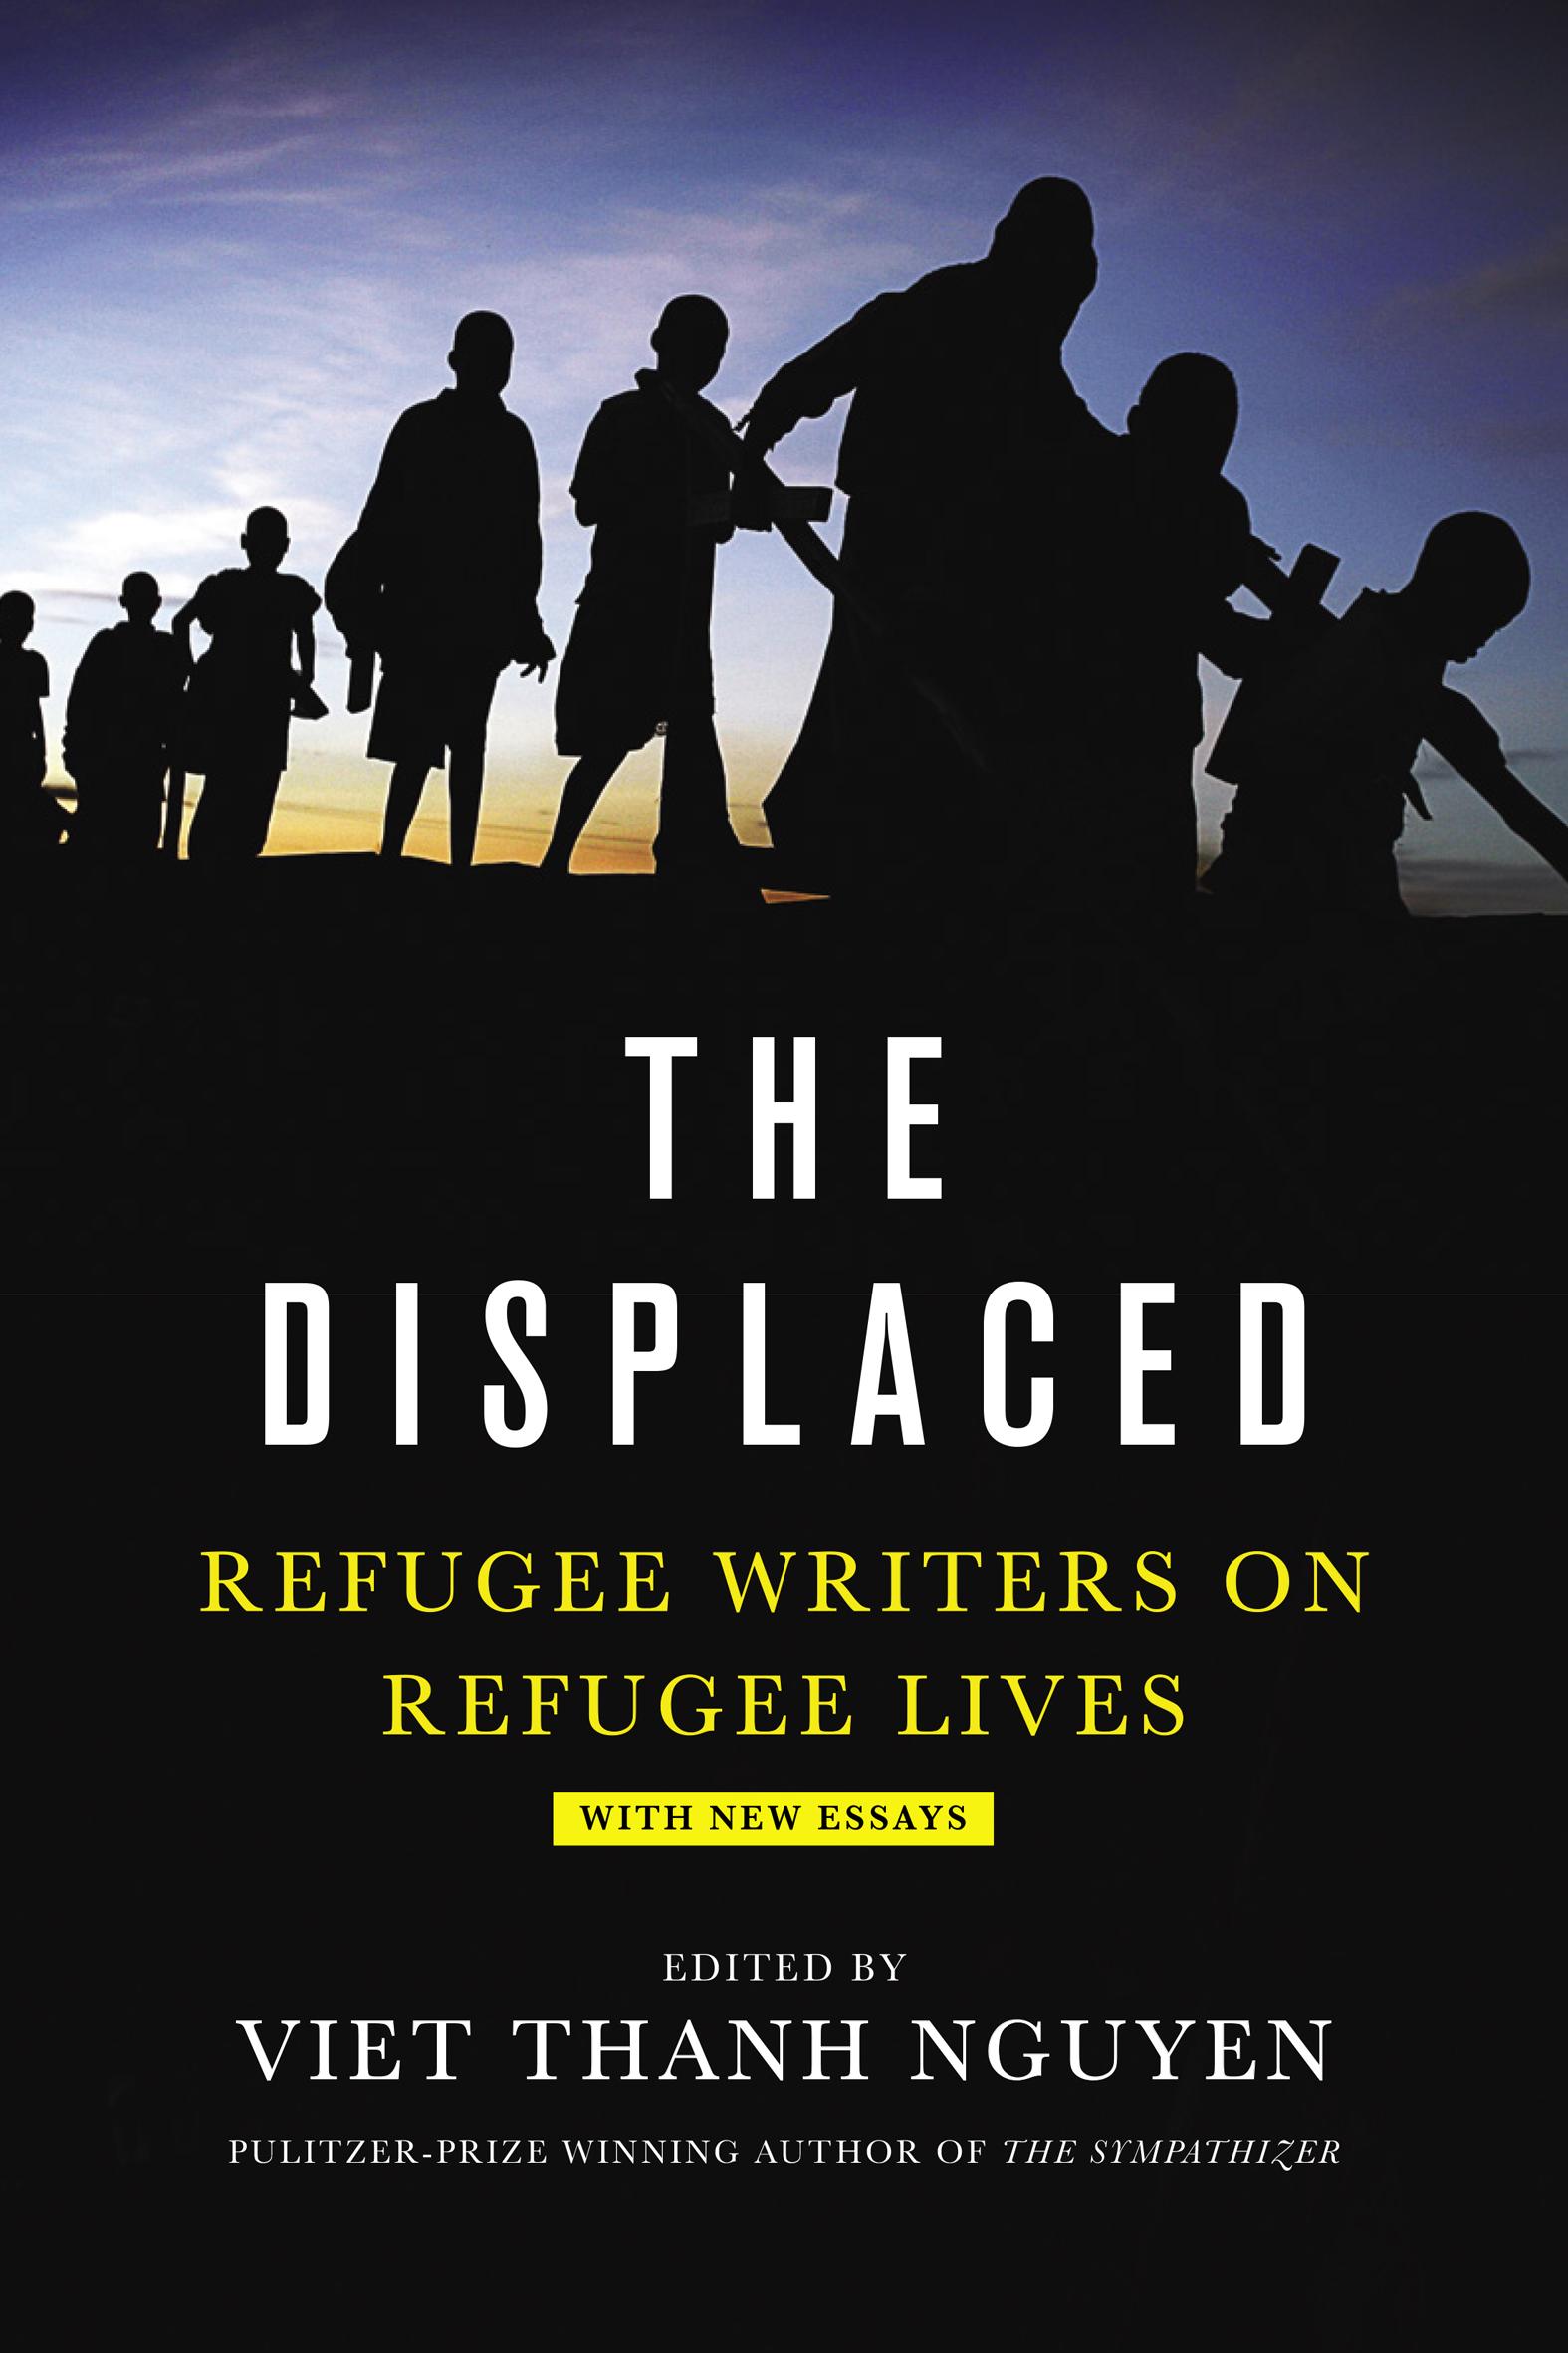 The displaced refugee writers on refugee lives